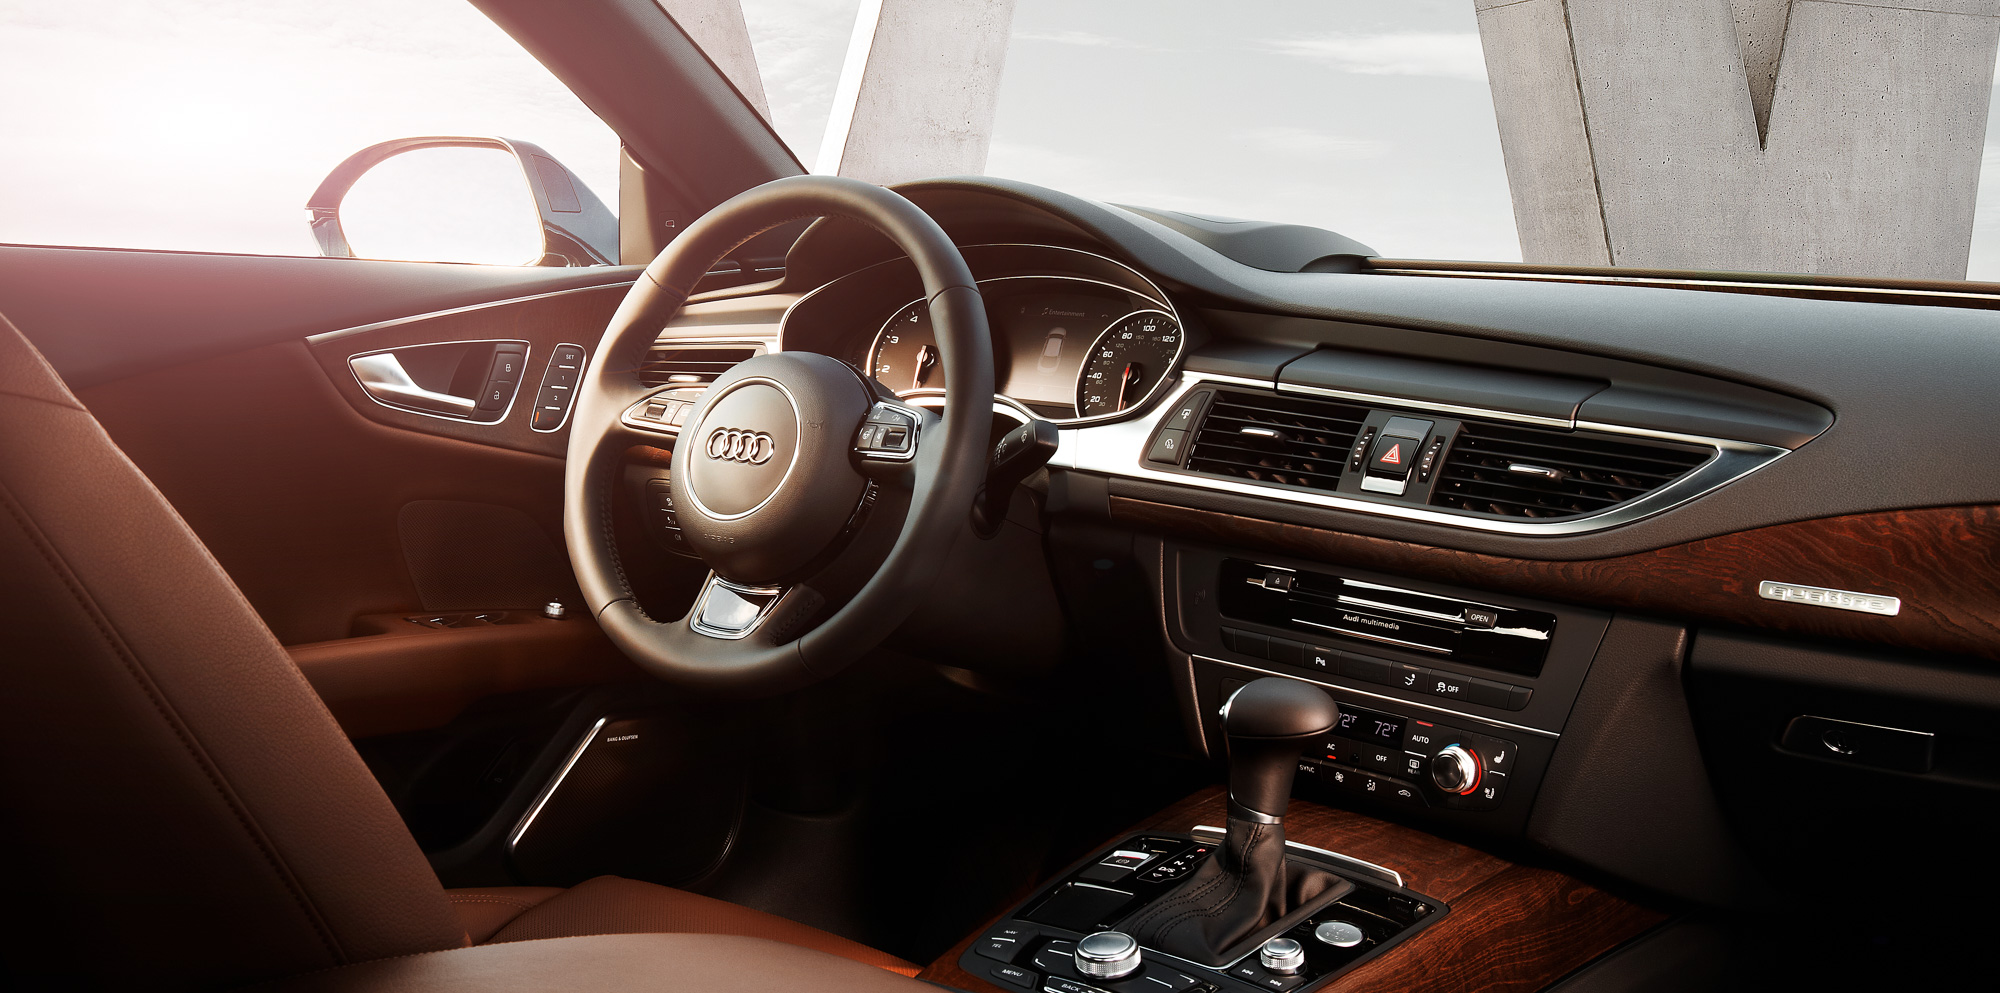 35_RESS_Audi_Interior_1329_3.jpg